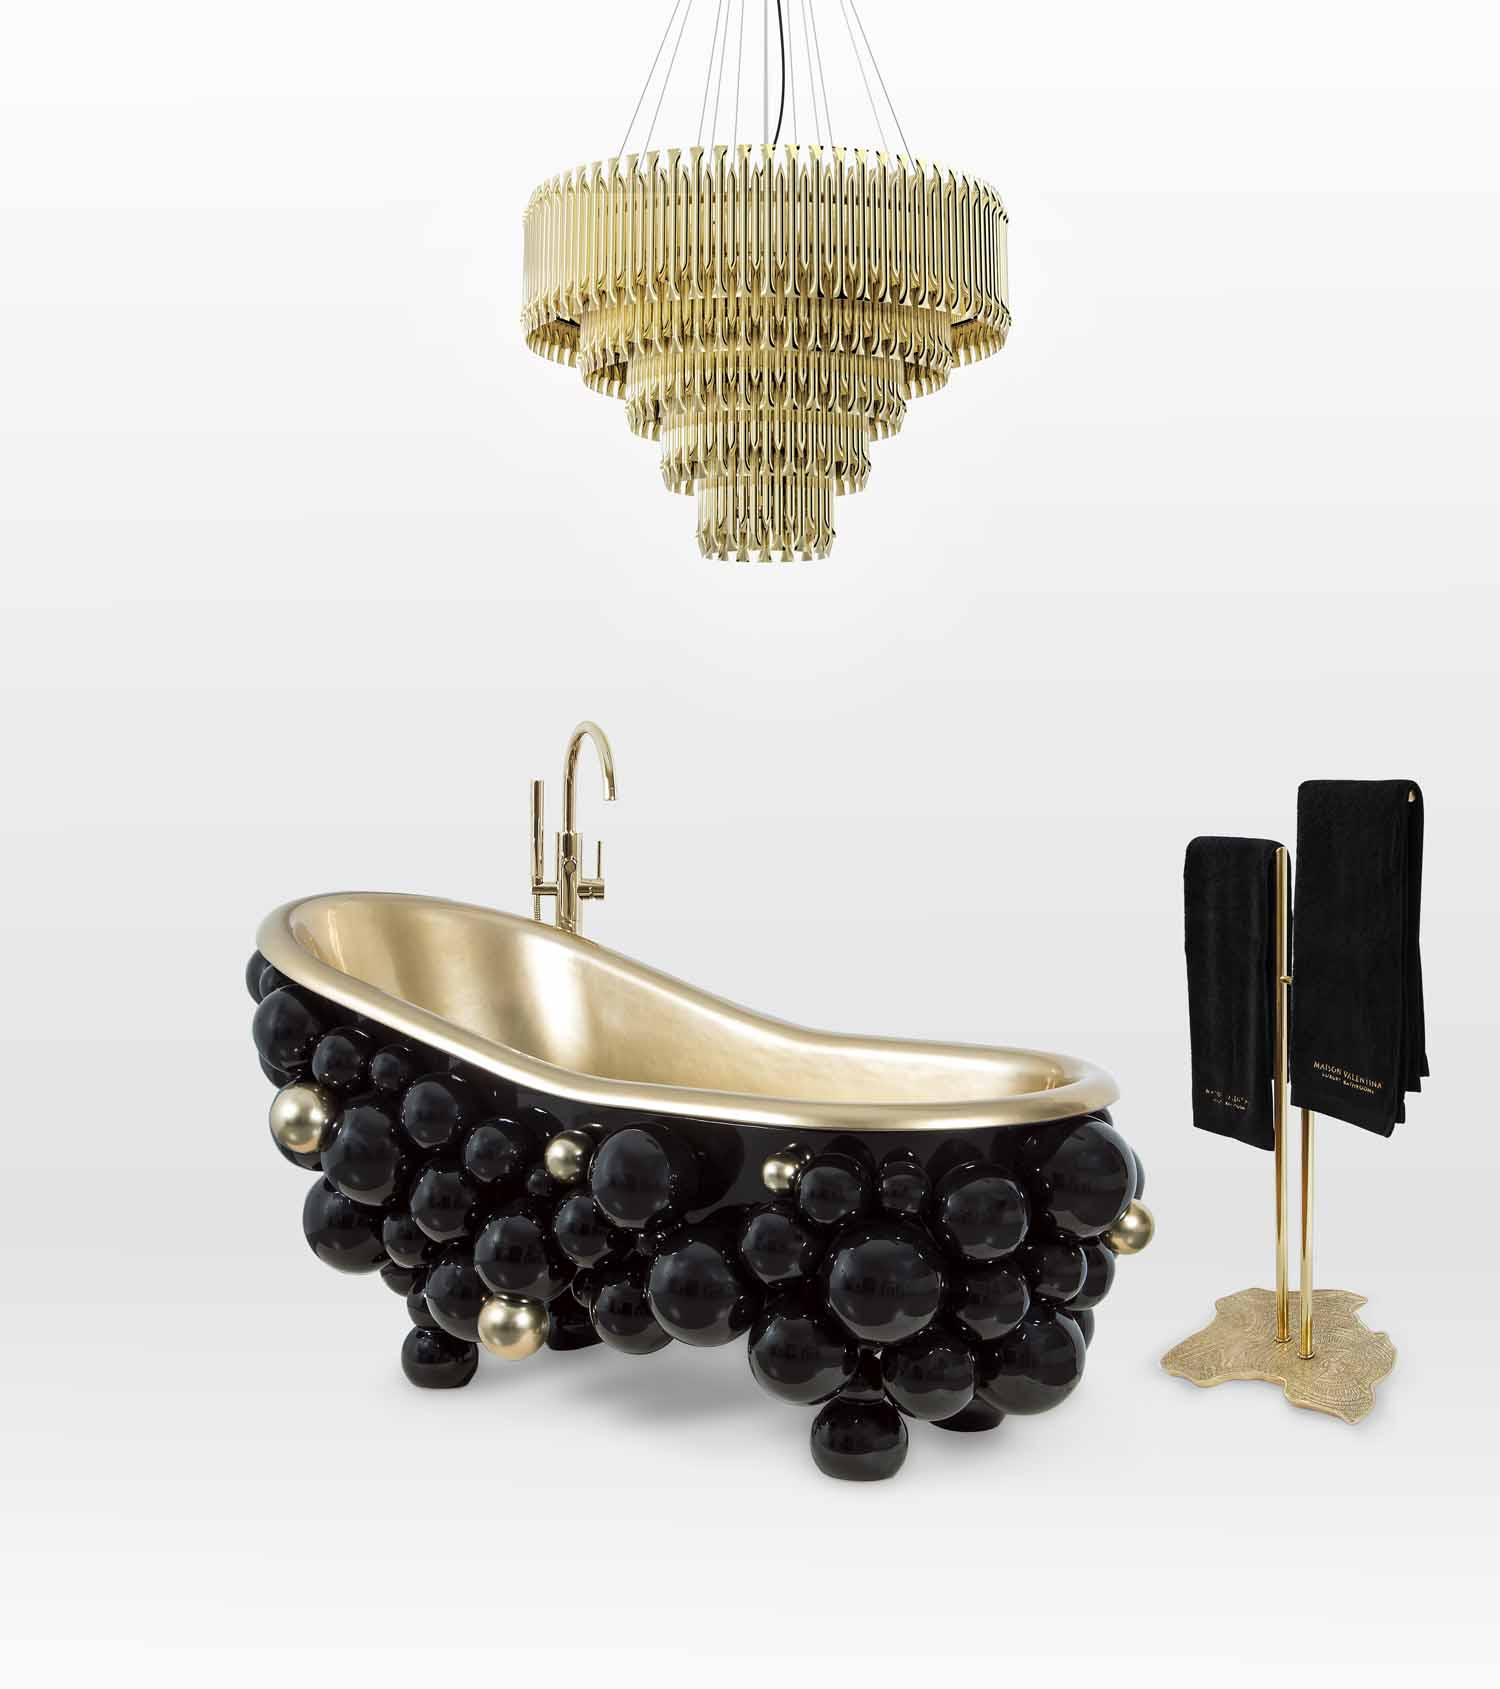 newton-bathtub-eden-towel-rack-maison-valentina-1-HR